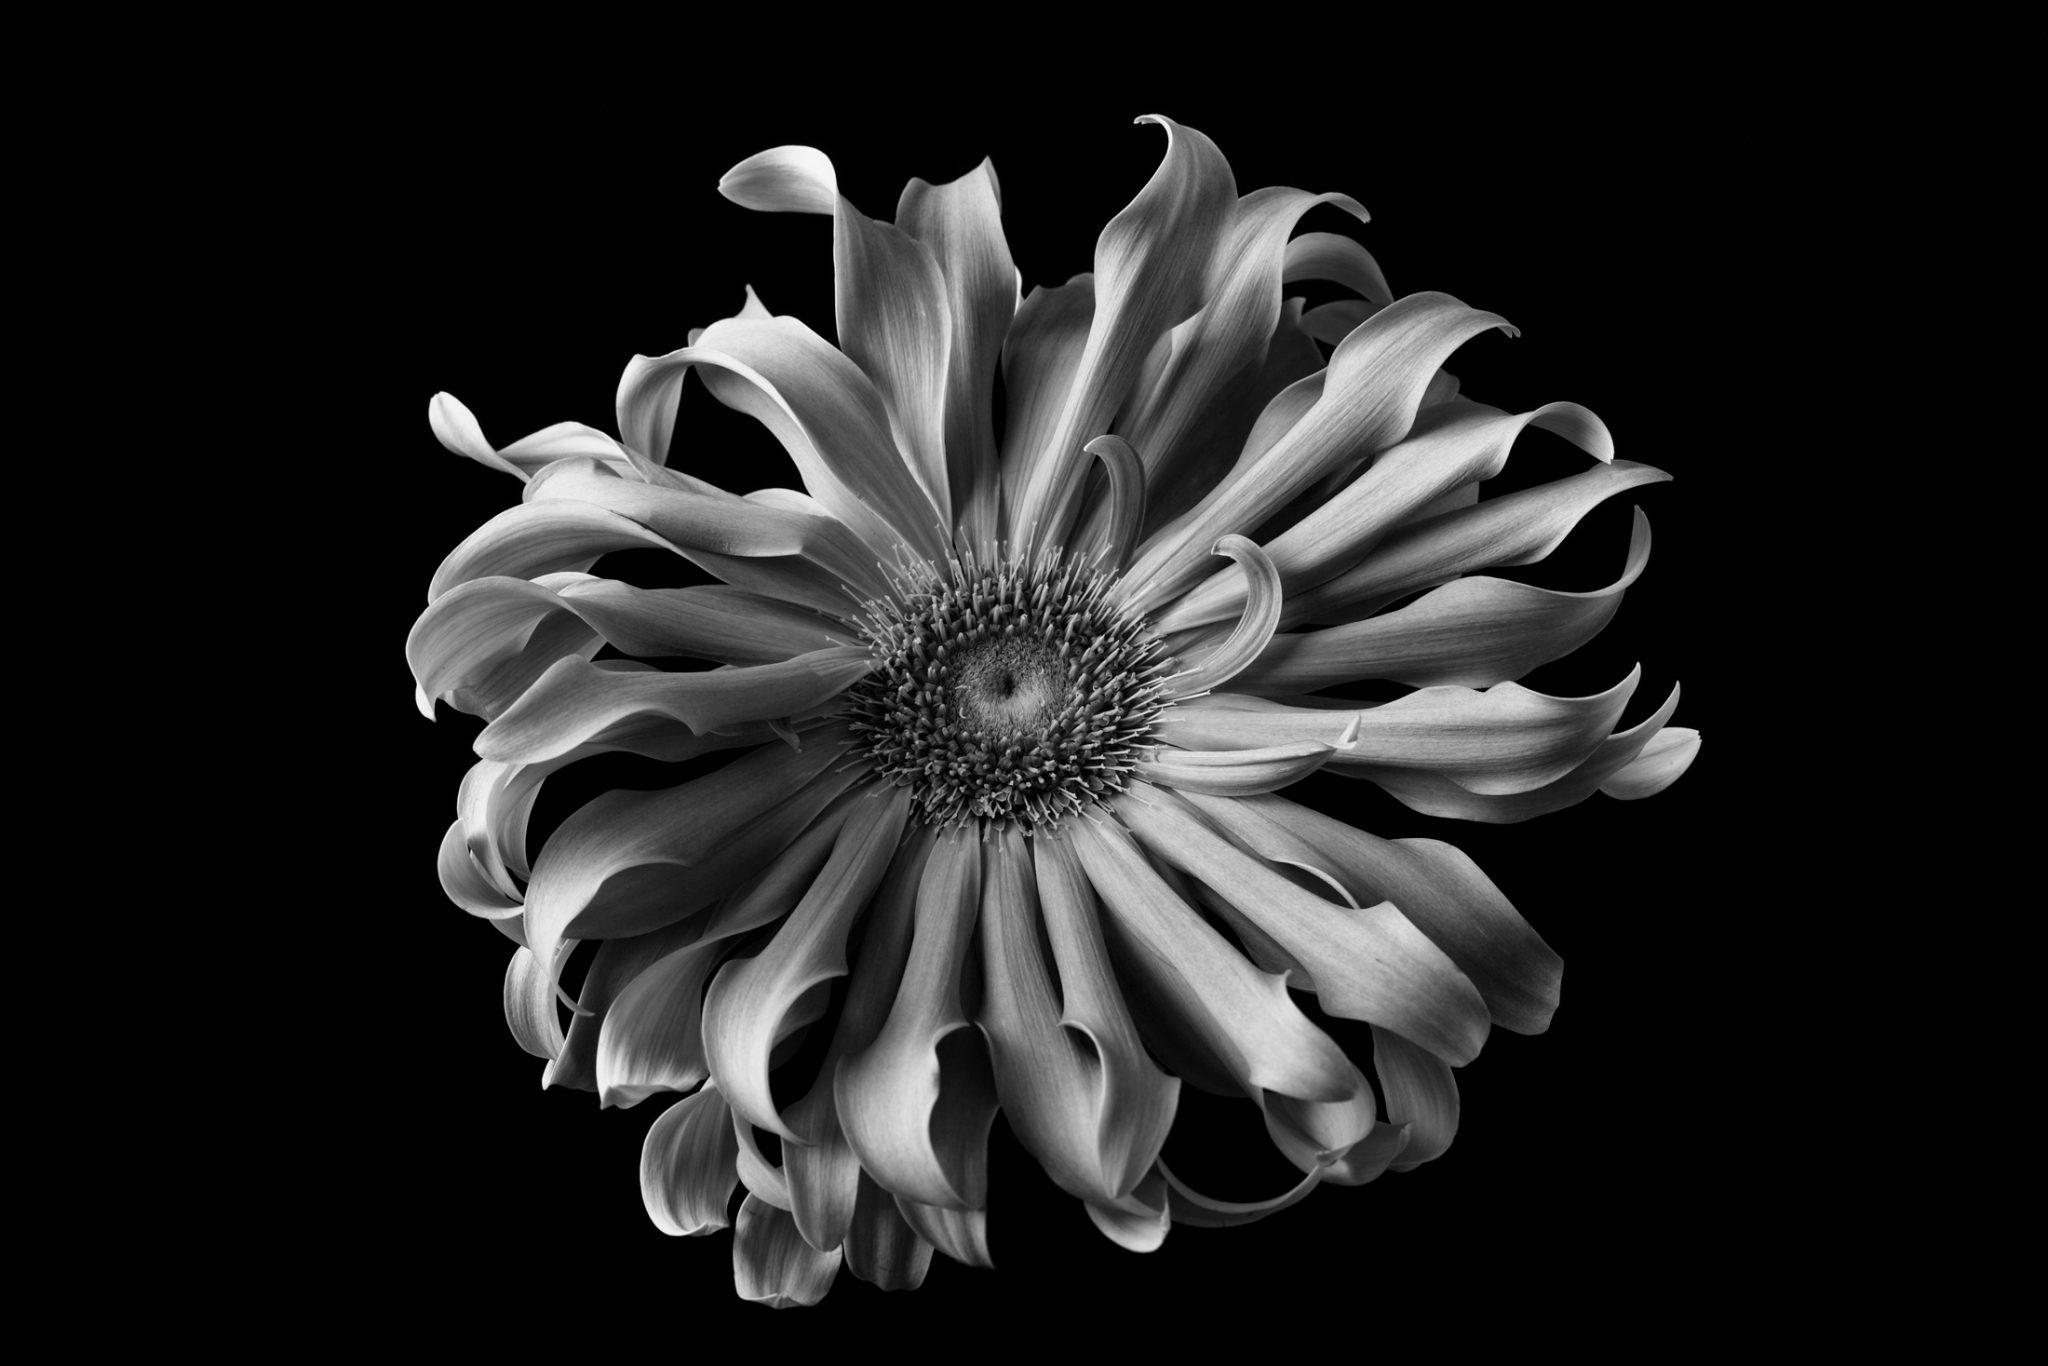 Monochrome Gerbera